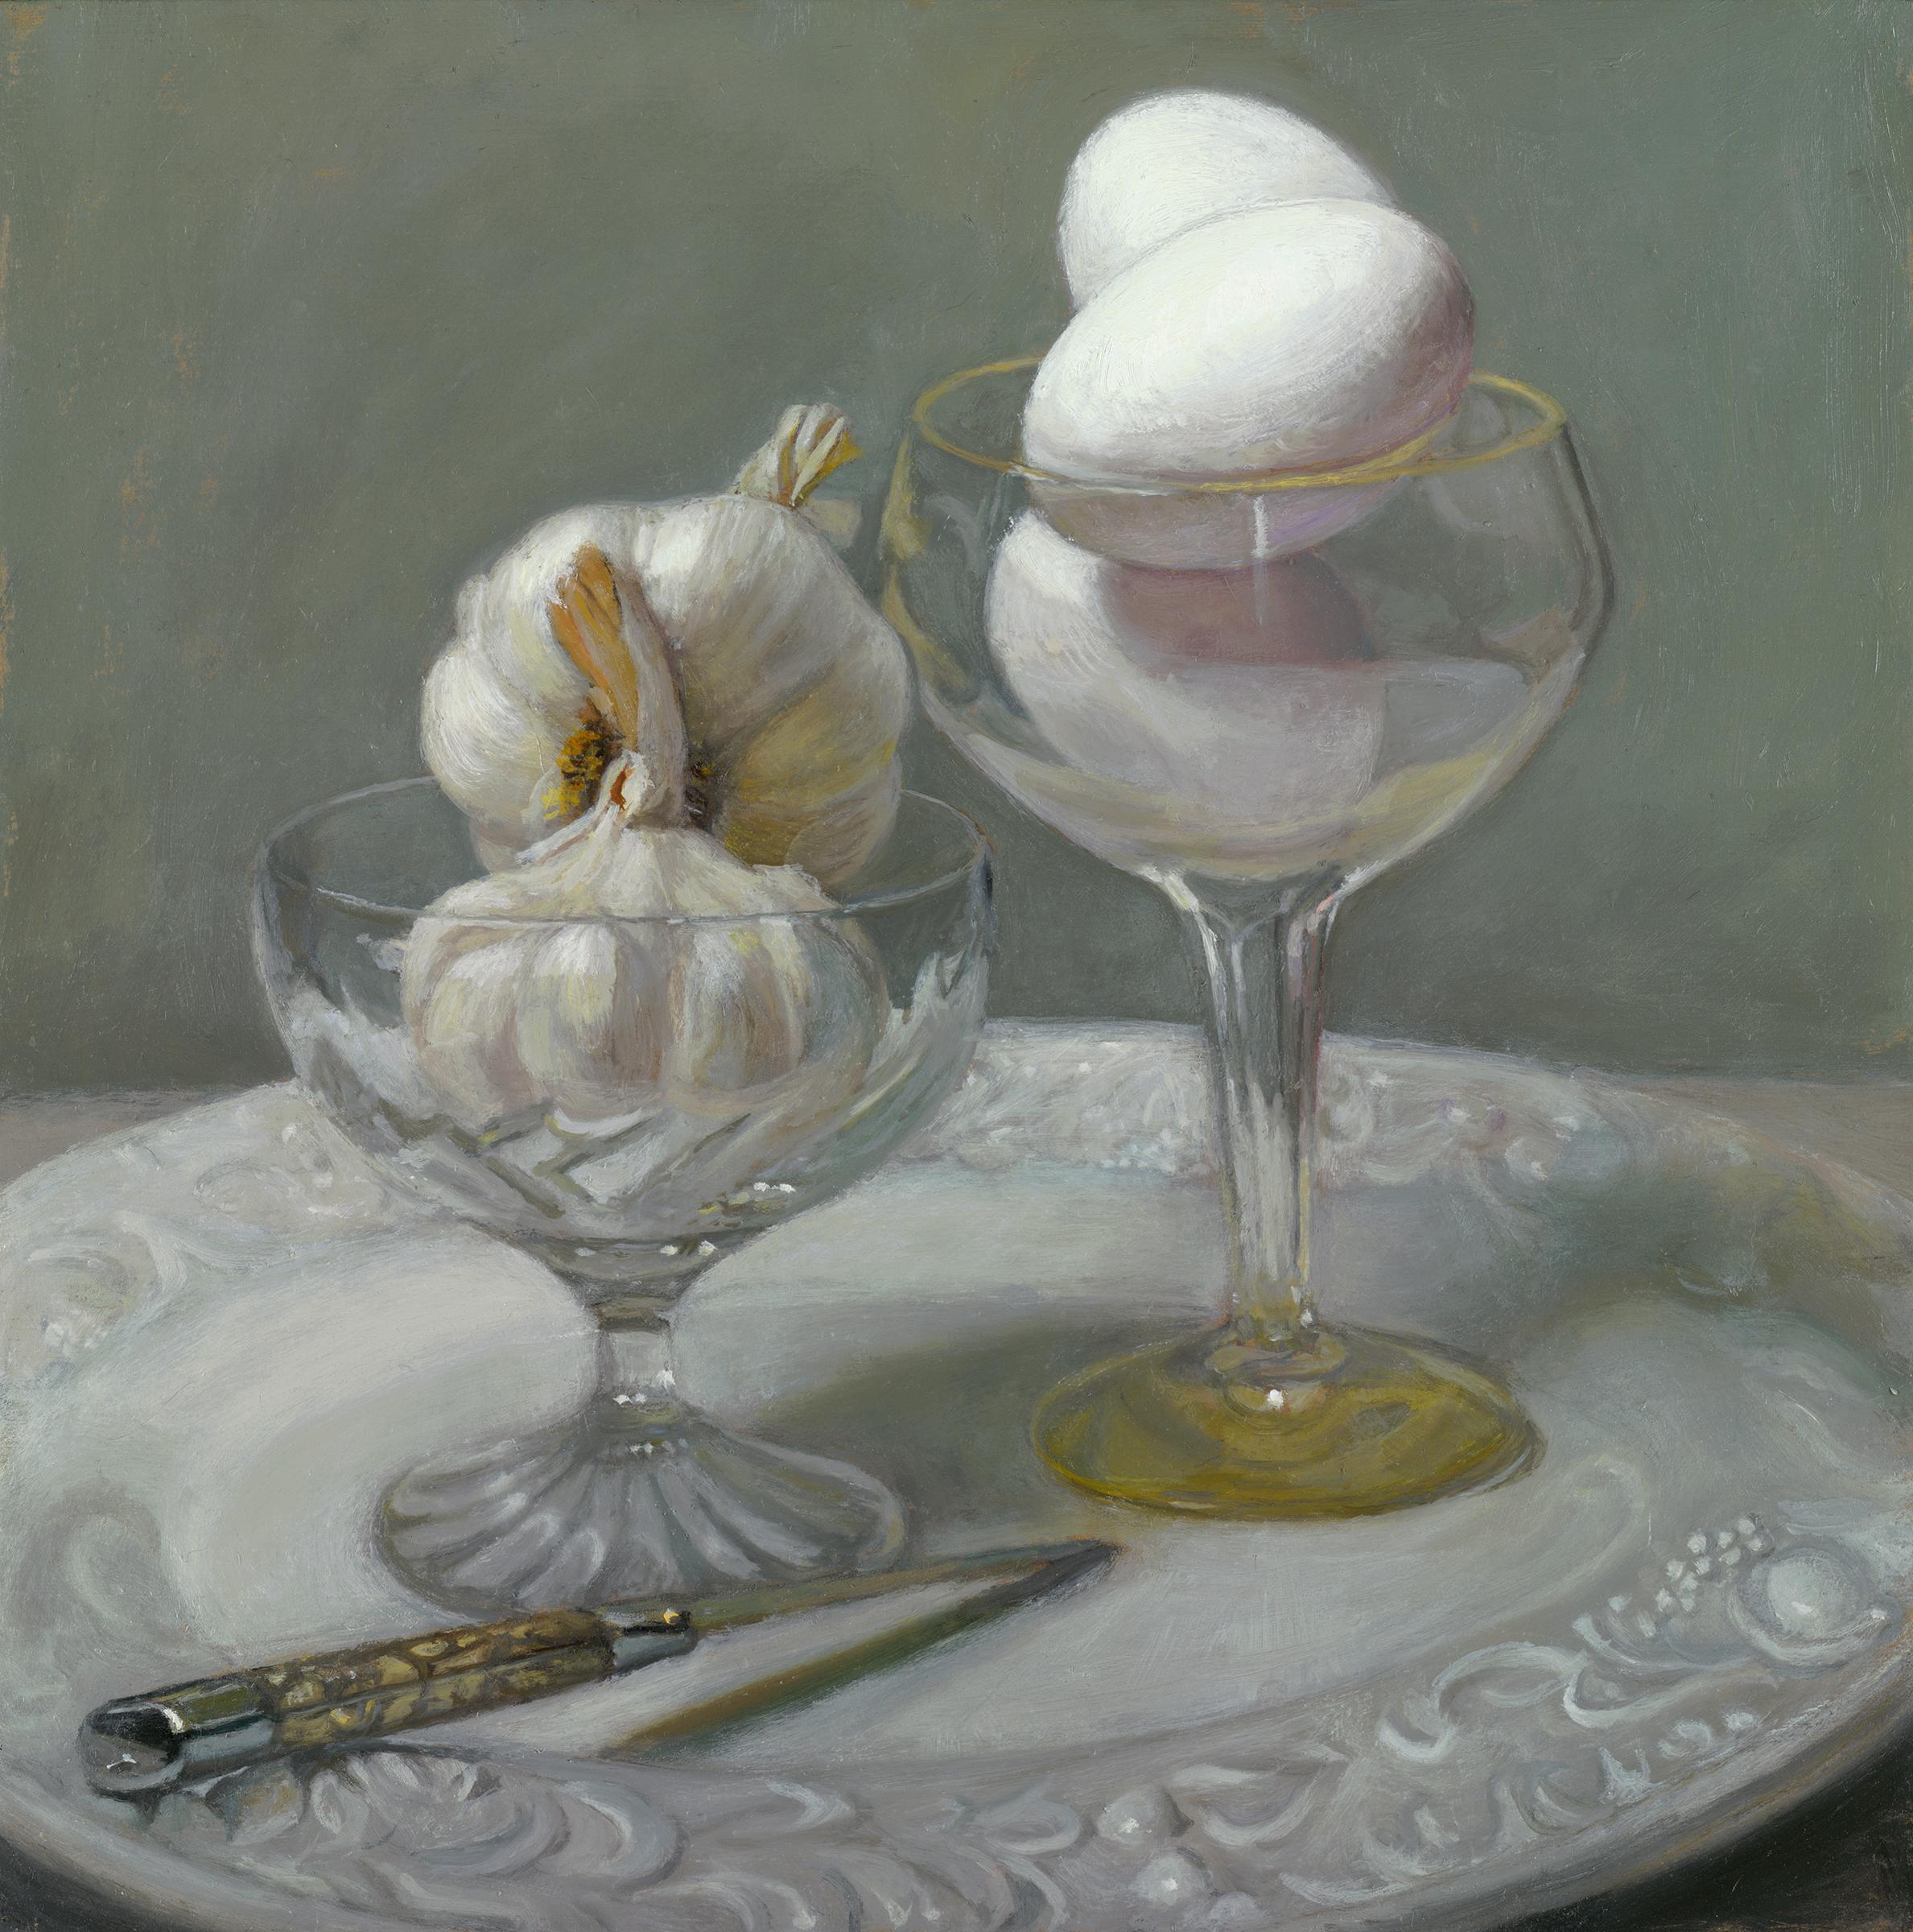 Garlic and Eggs